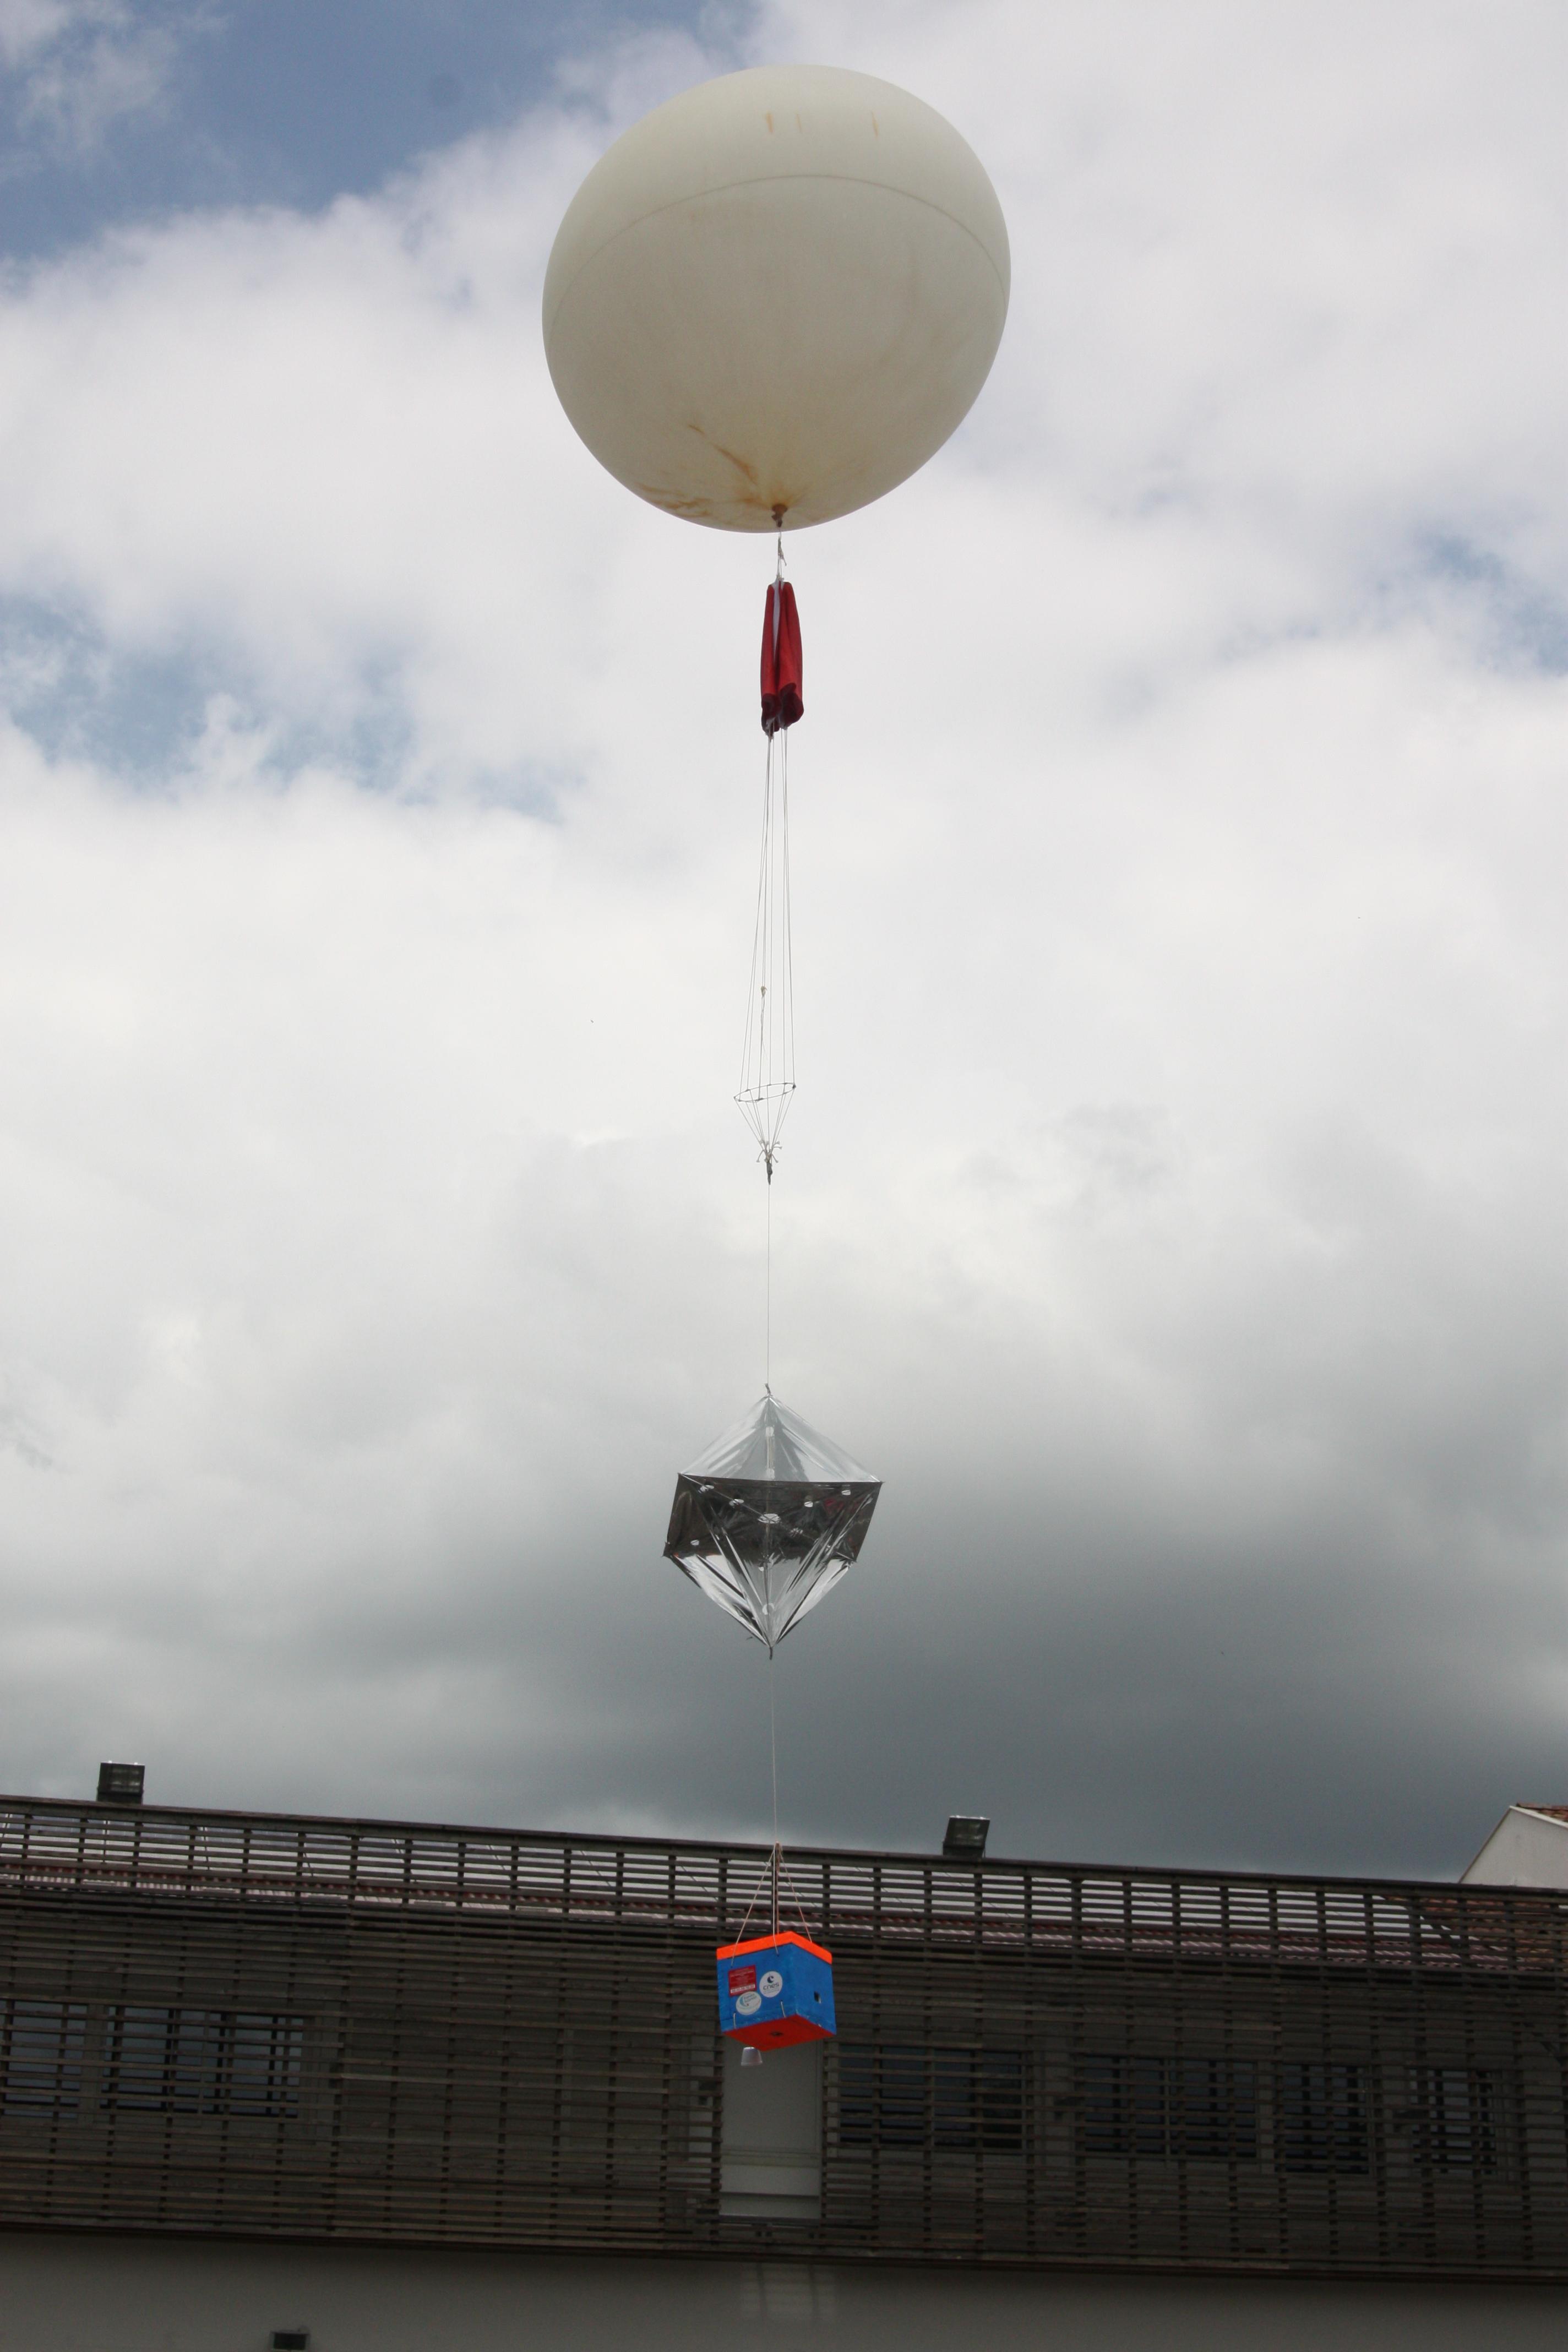 «Adishatz Là Haut !» – le Ballon-sonde des 3°A a décollé